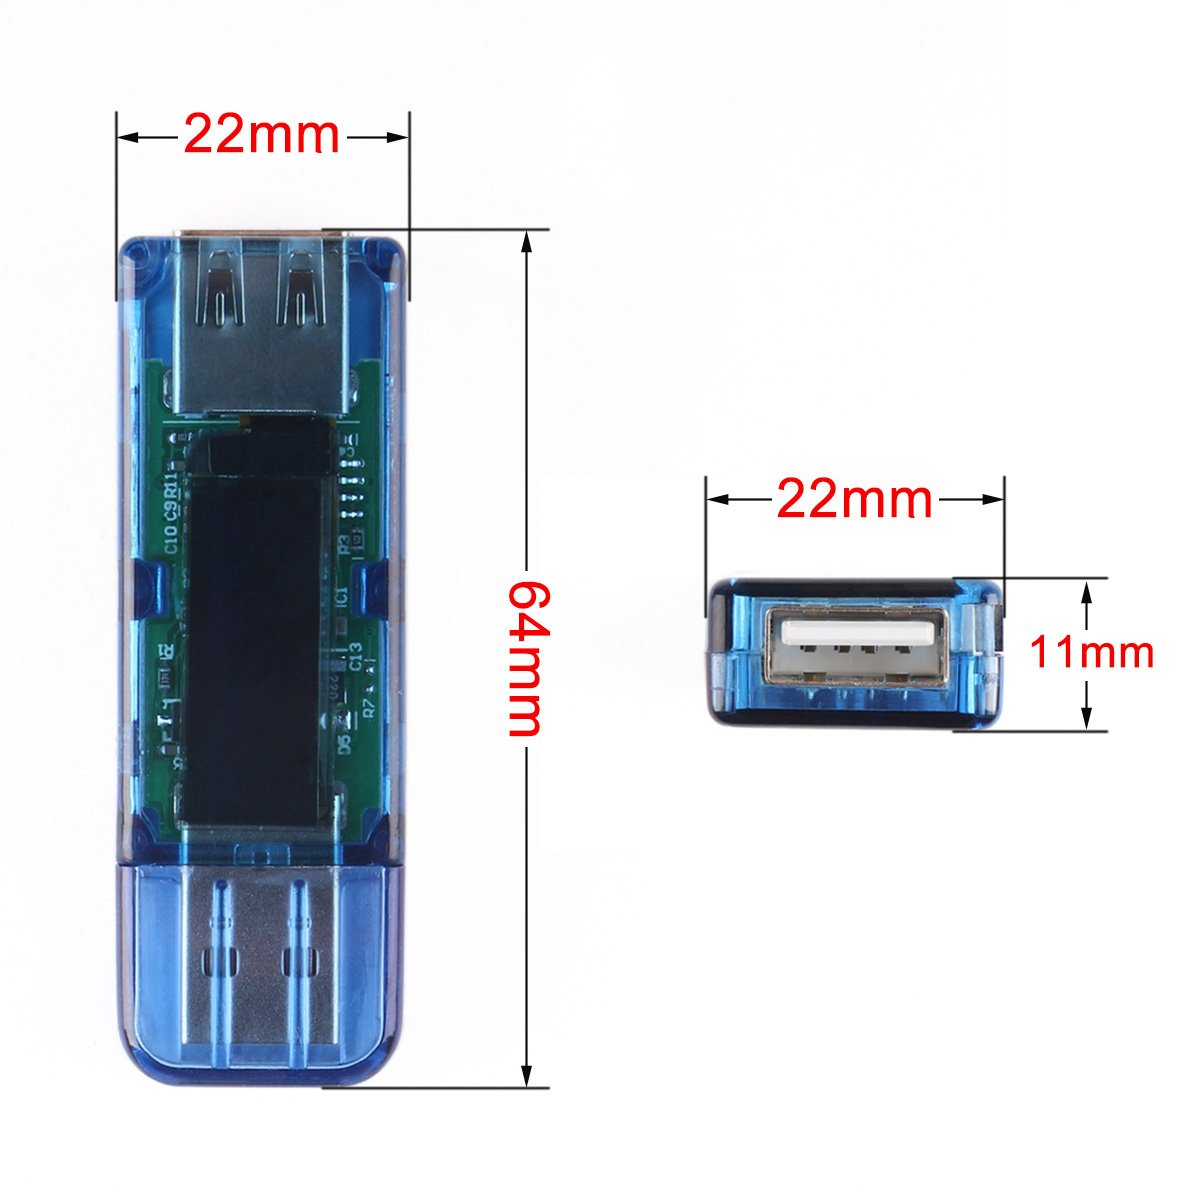 DROK® Mini USB Capacidad de corriente Voltaje Cargador Detector multímetro Poder 0-99999mAh; 0-30.00W; DC 0.00-3.00A; DC 3.50-13.0V amperímetro del ...